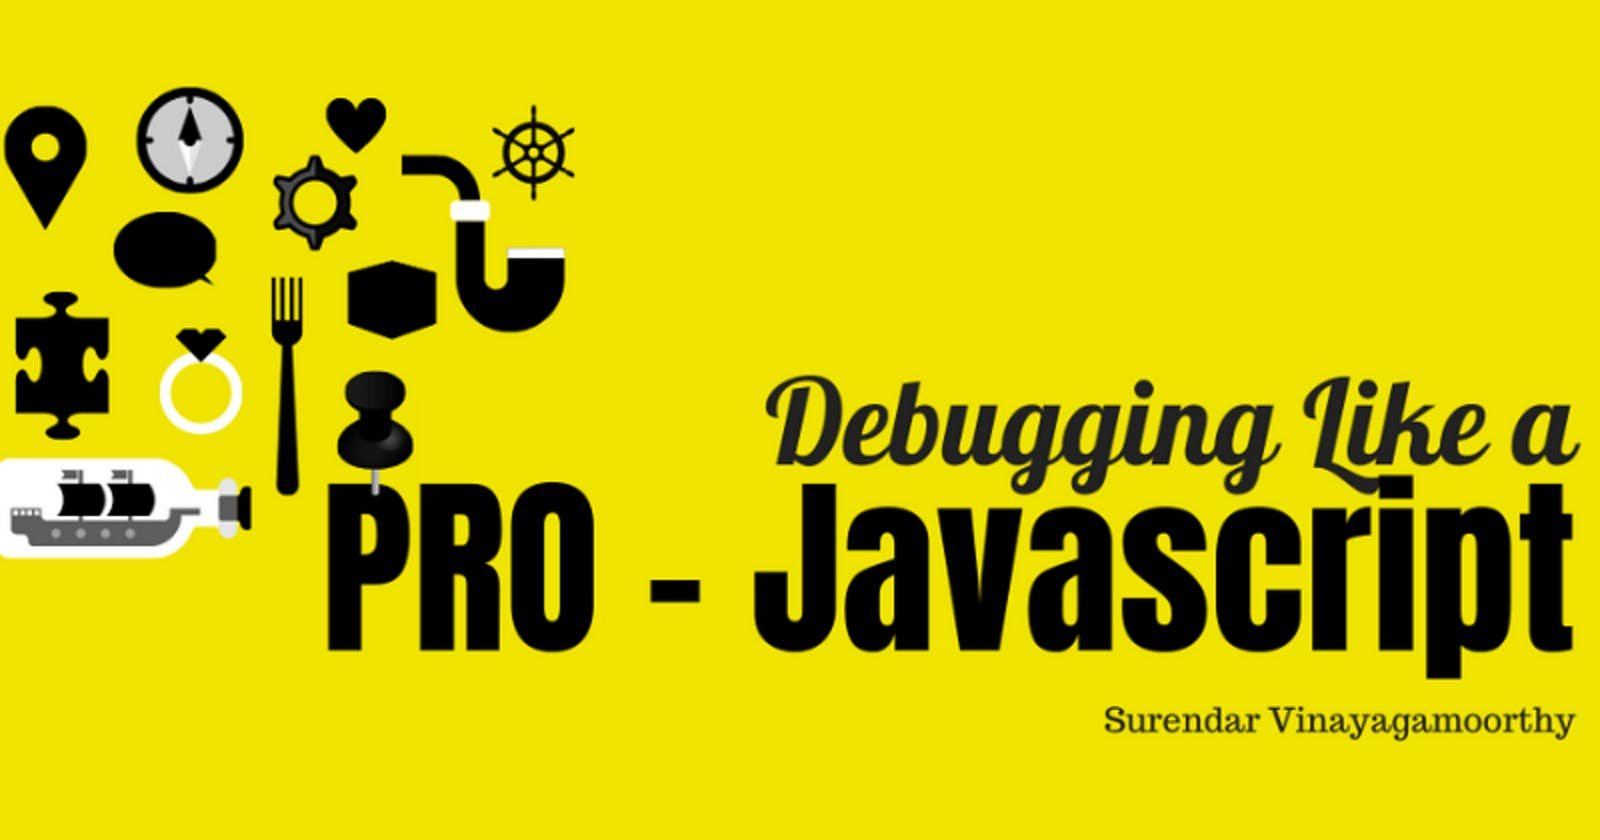 Console API - Debugging Like A PRO - Javascript